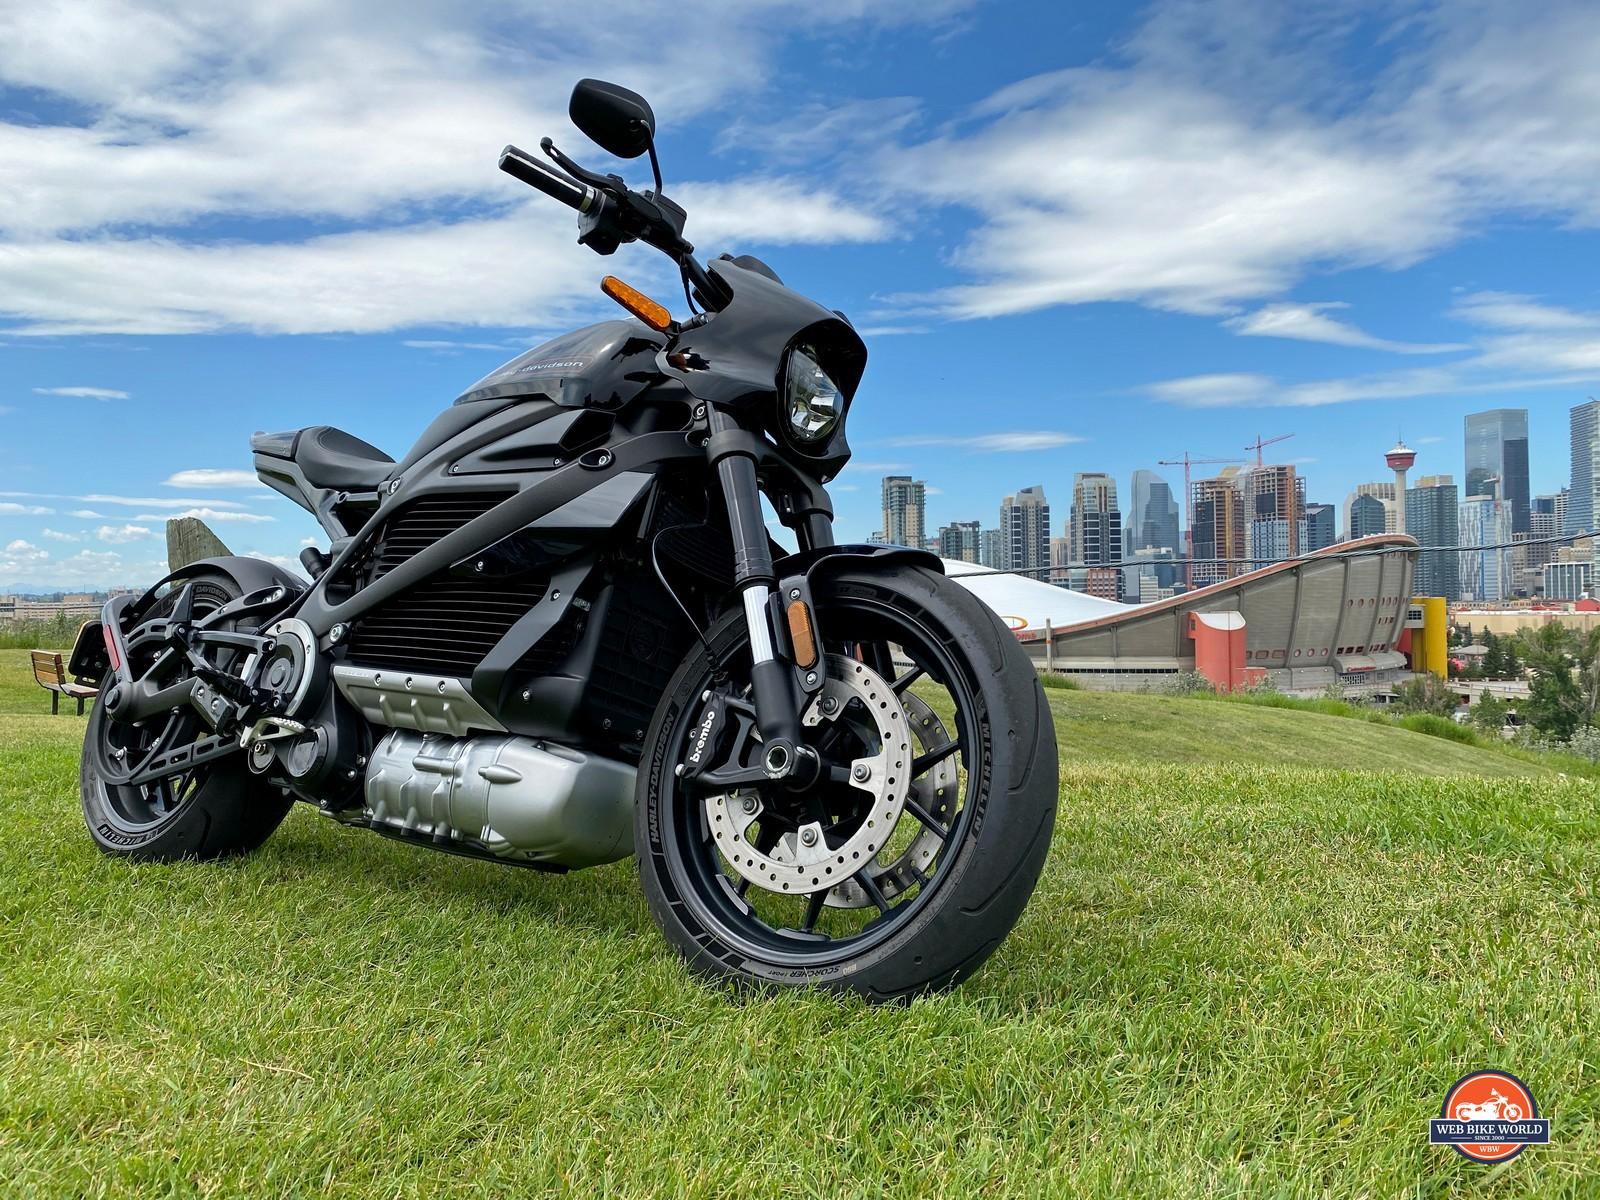 The 2020 Harley Davidson Livewire.